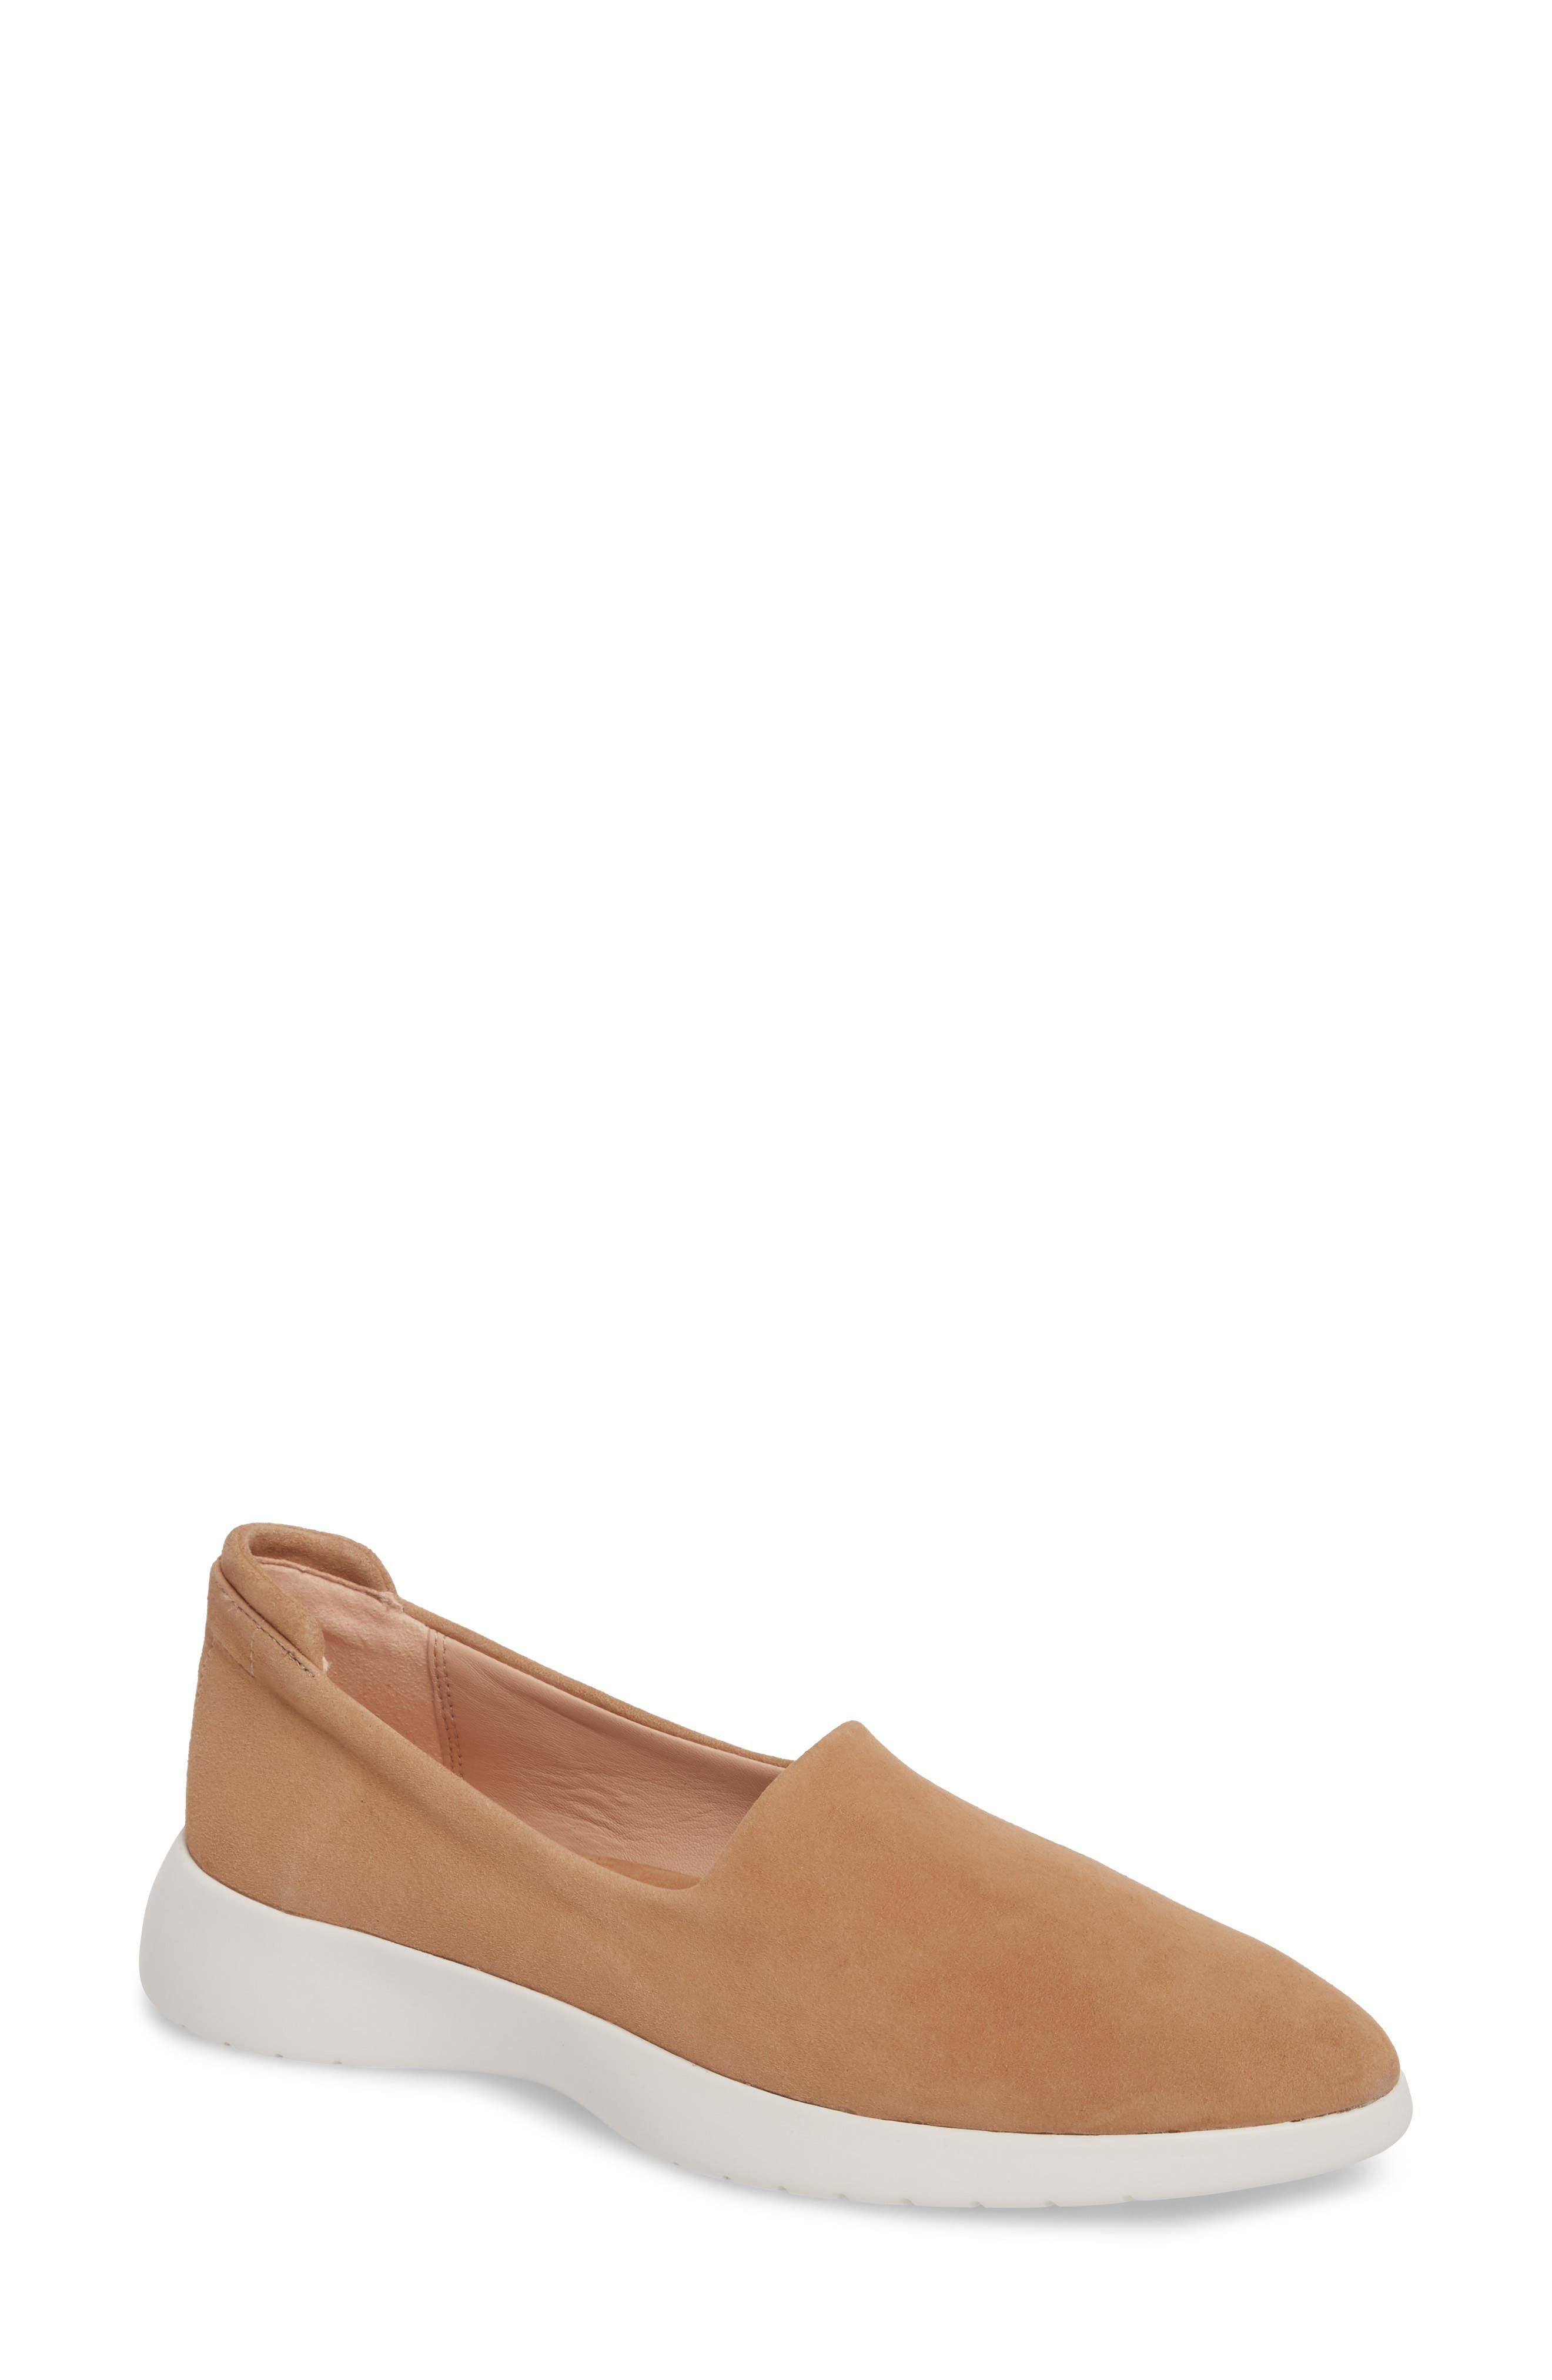 Darla Slip-On Sneaker,                             Main thumbnail 1, color,                             SOFT BEIGE SUEDE